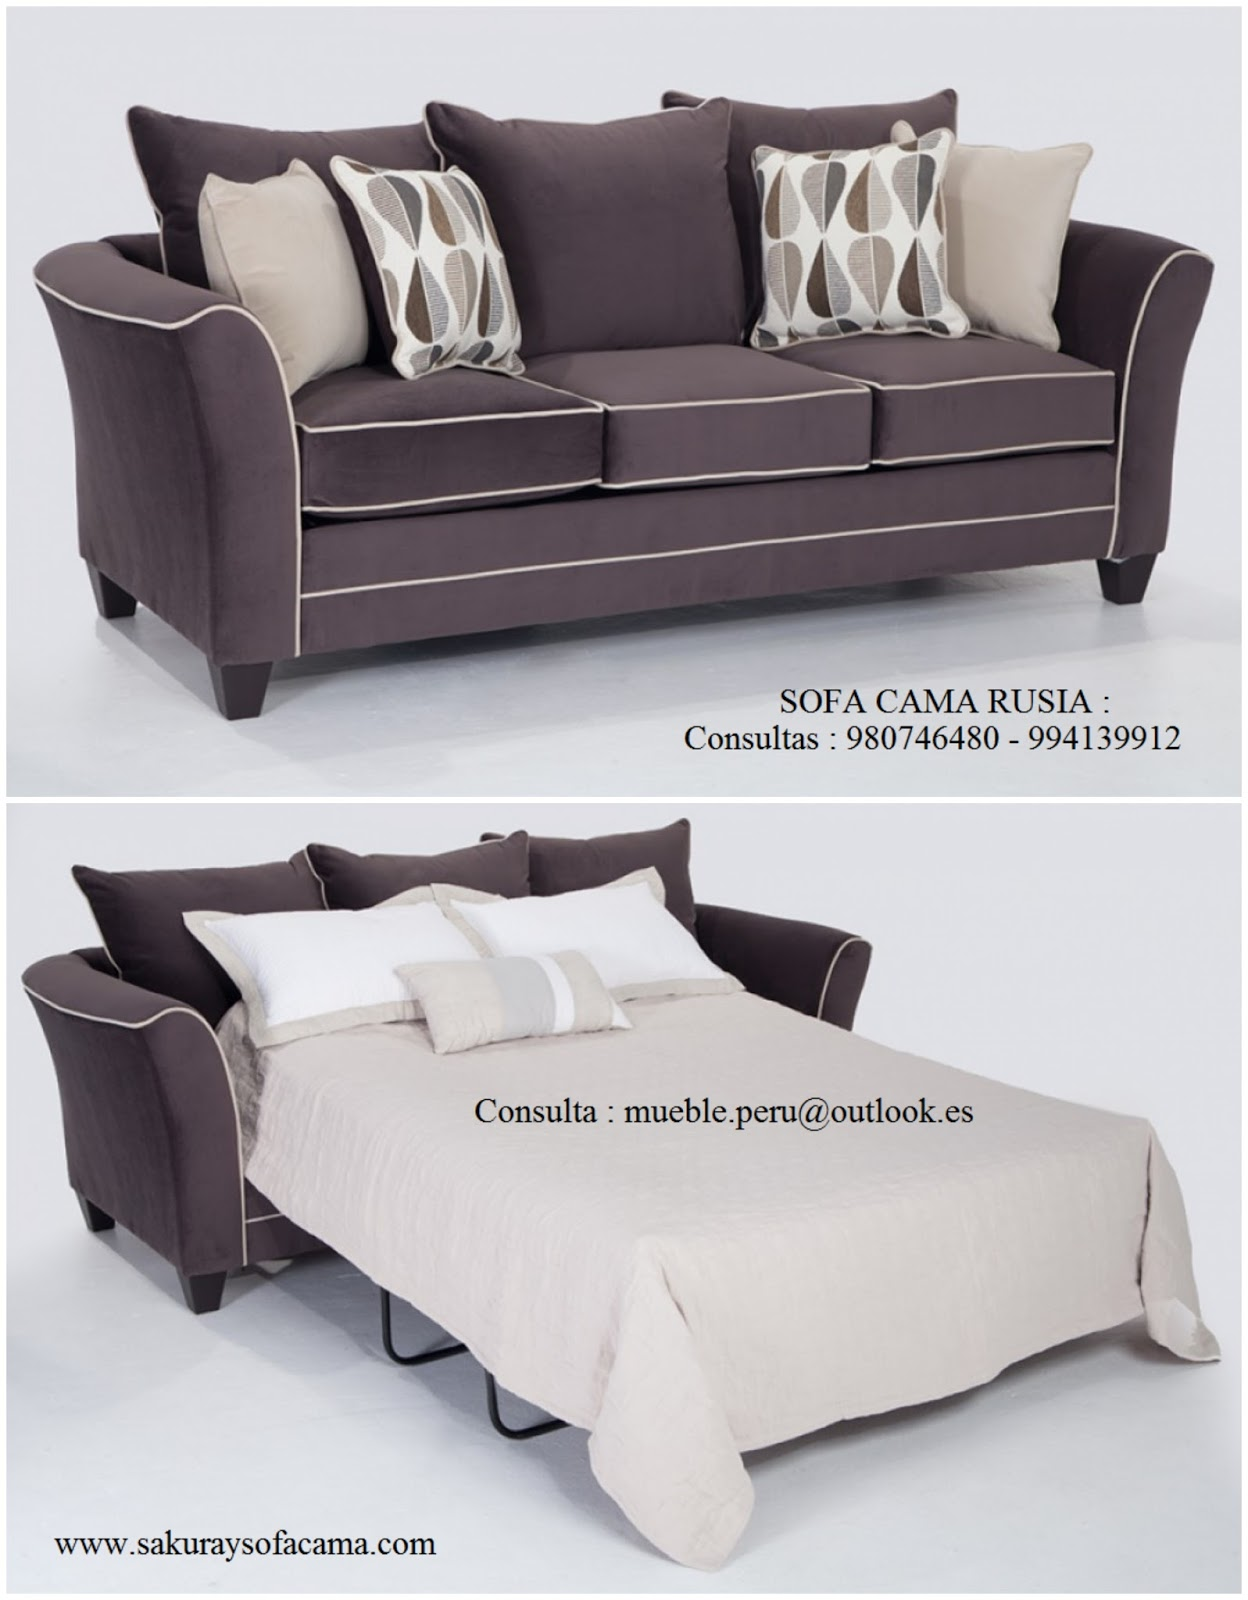 Mueble peru sakuray sofa cama rusia for Mueble divan cama